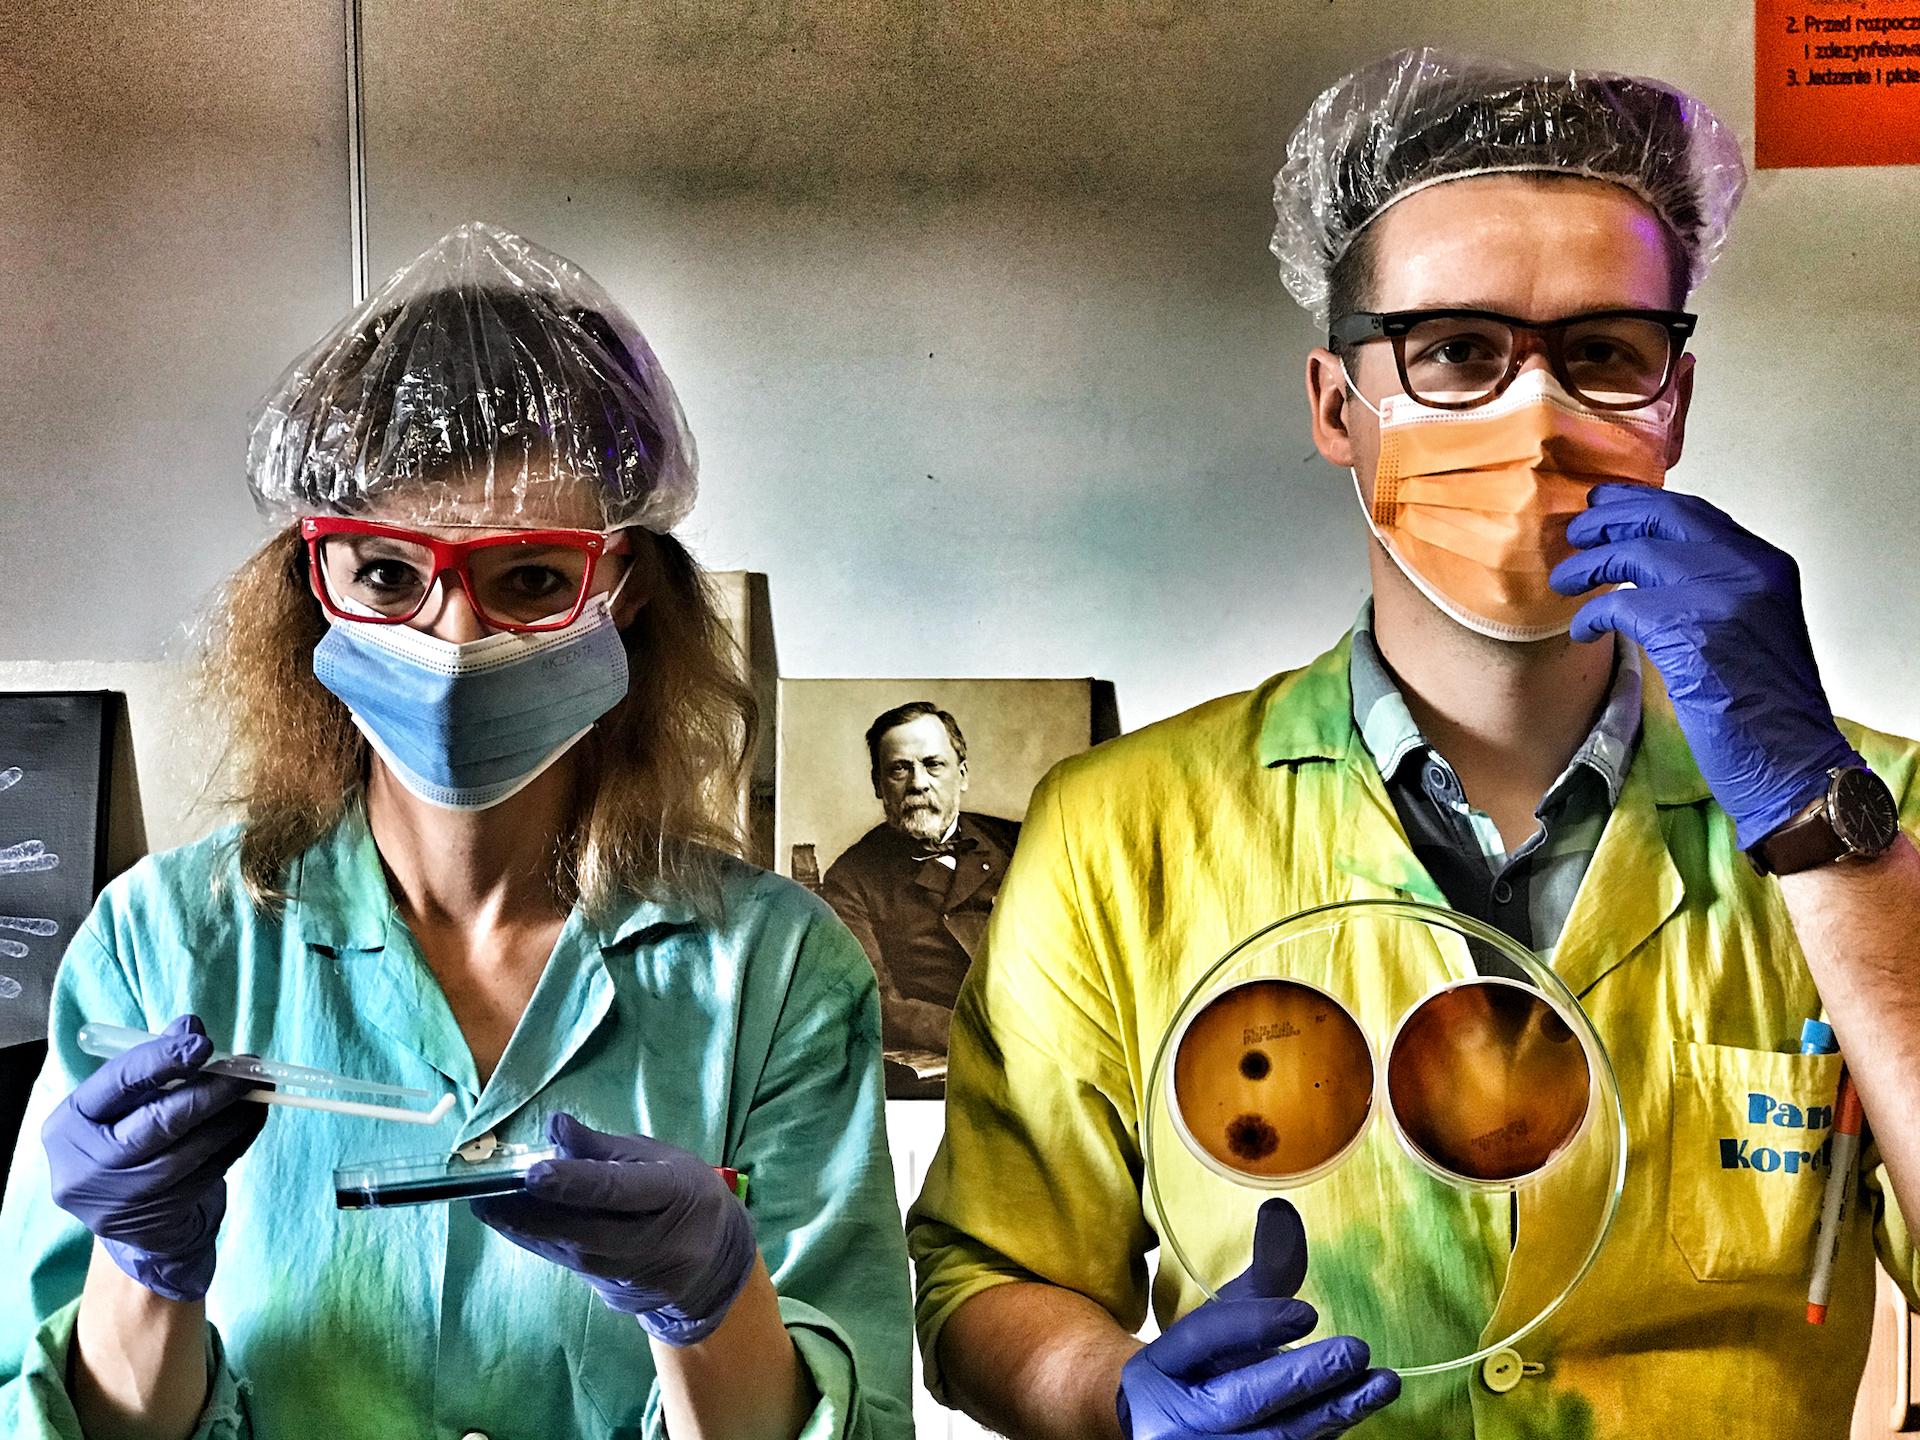 Biotechnolodzy Pana Korka